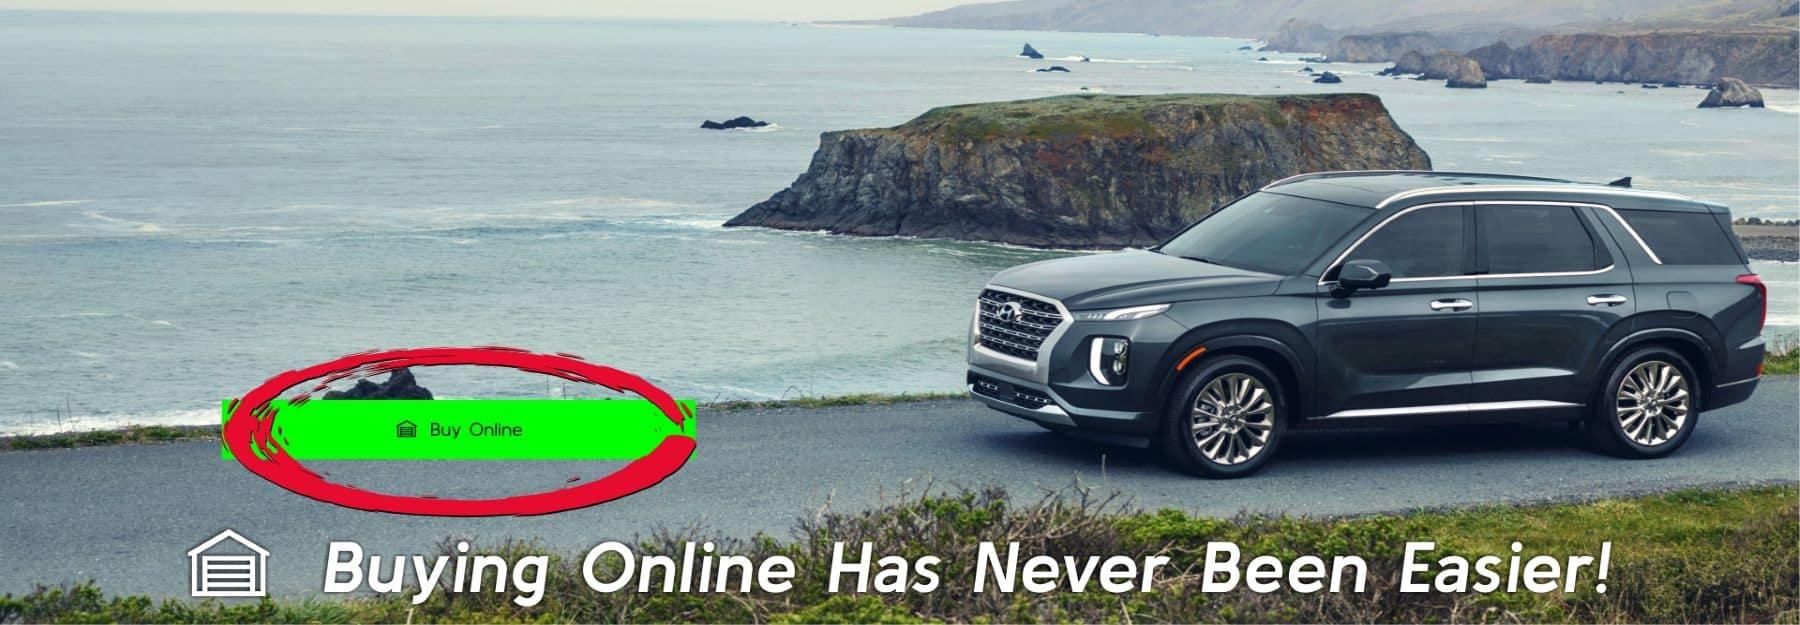 Reed Hyundai Web Homepage March 2020_1800X625